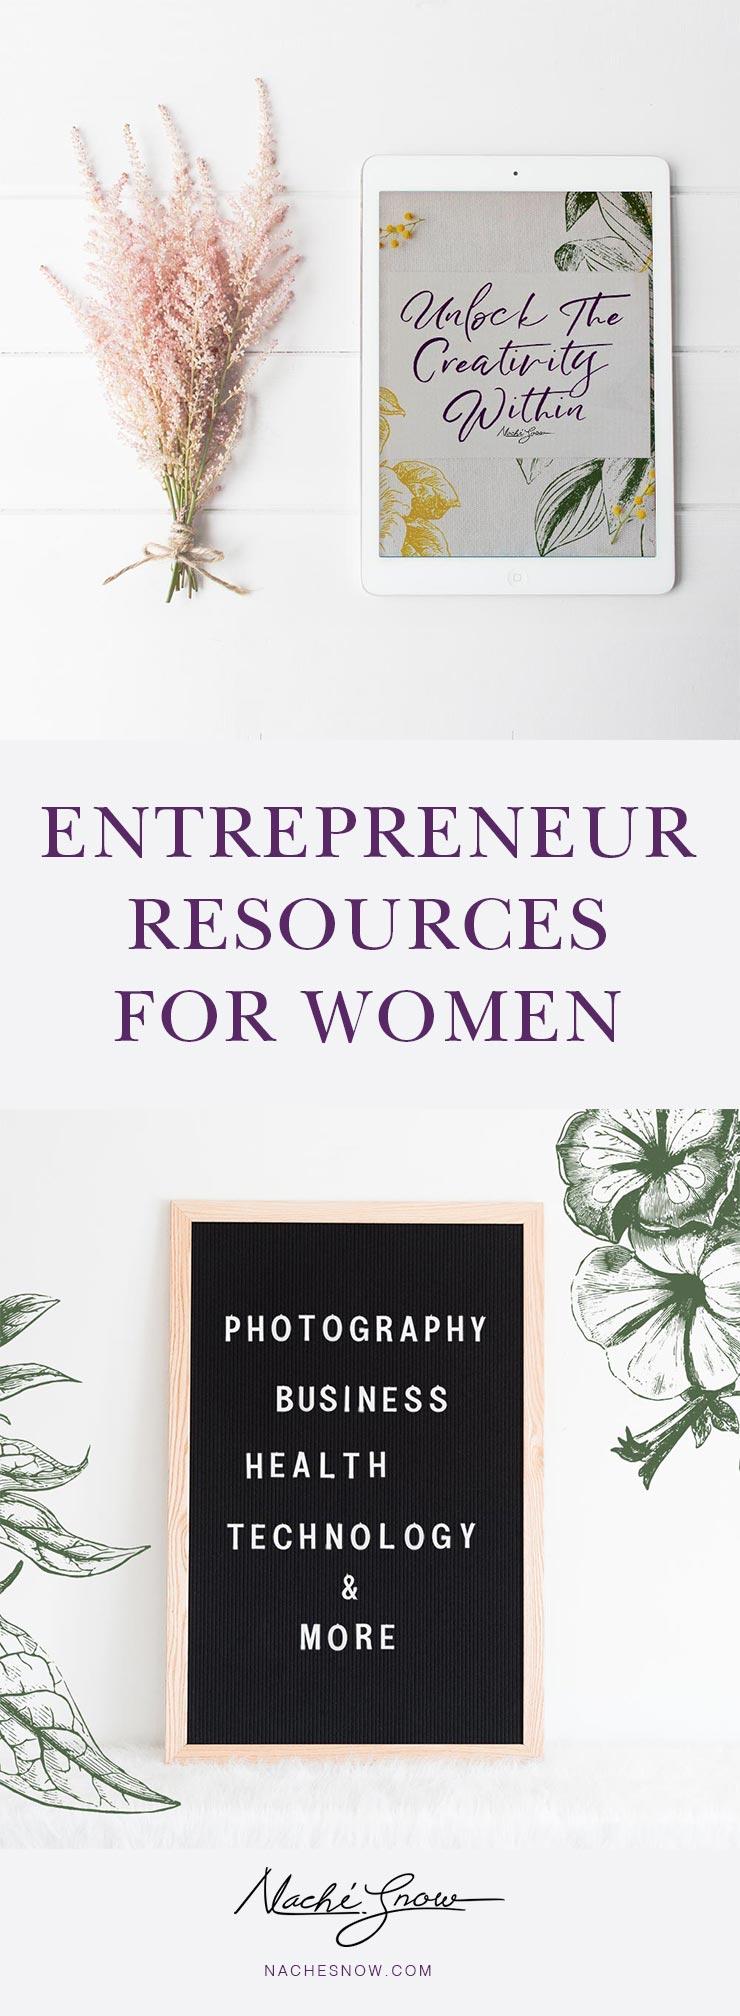 Nache Snow | Entrepreneur Resources for Women + Studio 78 Podcast | nachesnow.com